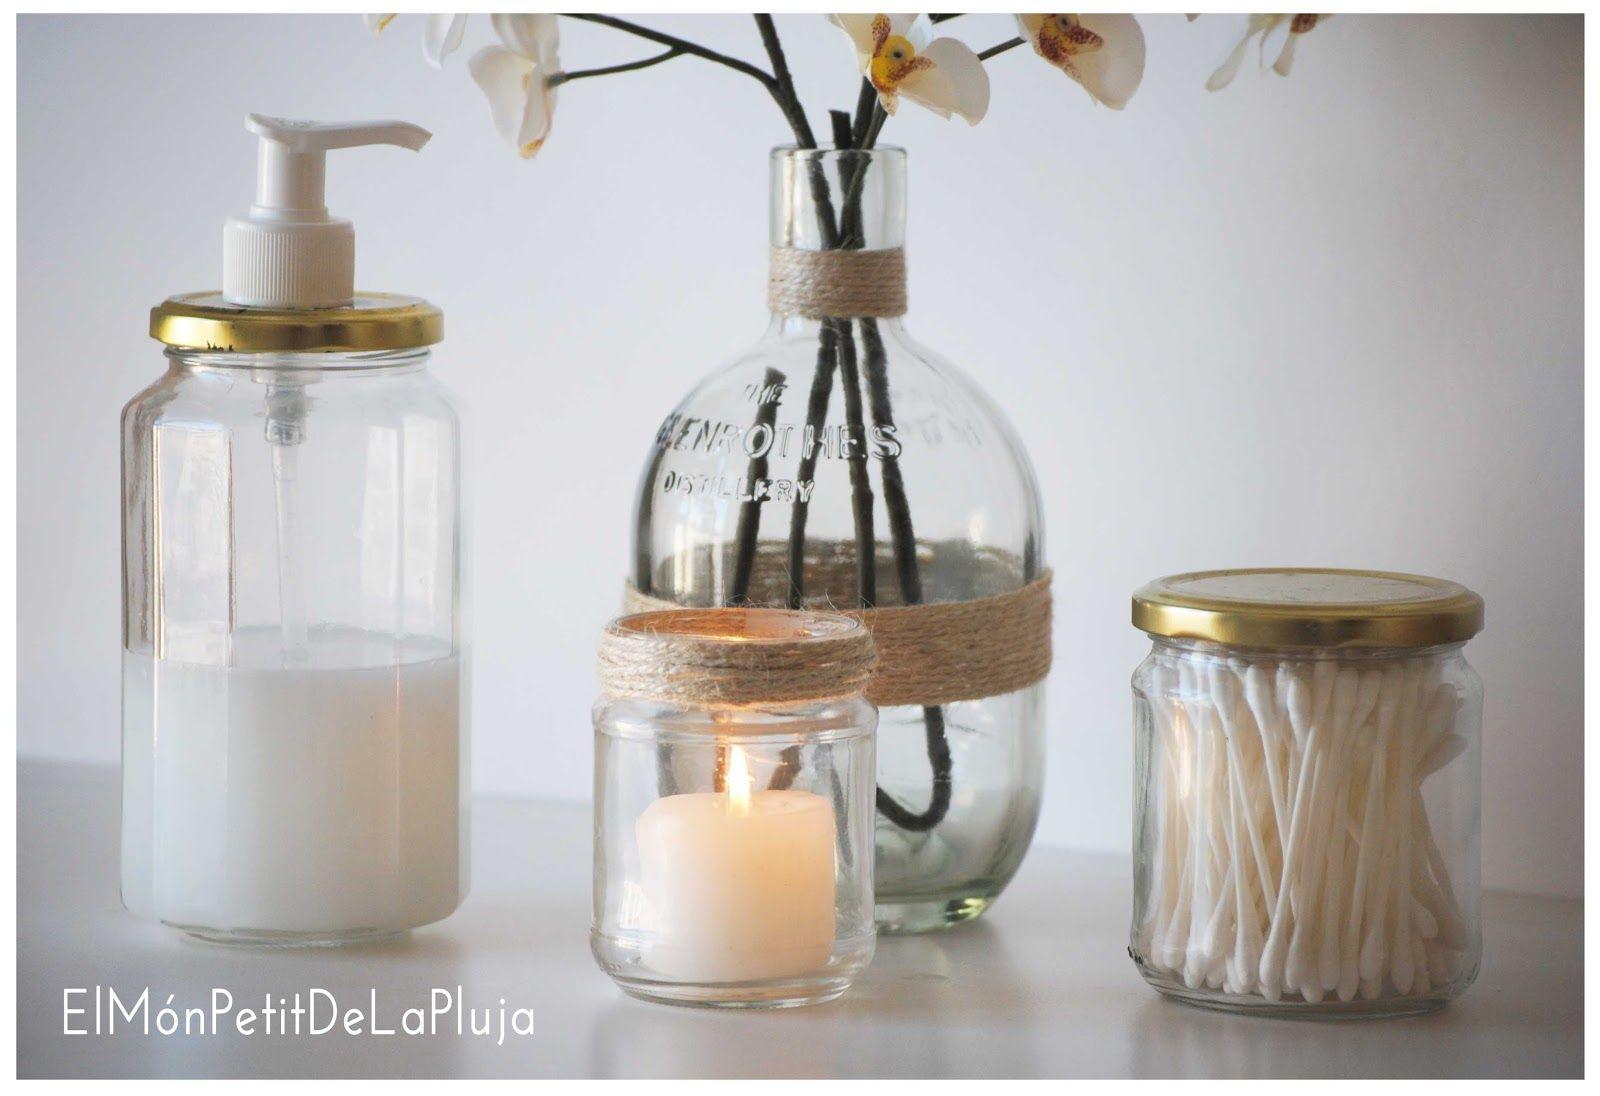 Set de ba o con tarros de cristal reciclados ideas para - Manualidades con botellas de cristal ...